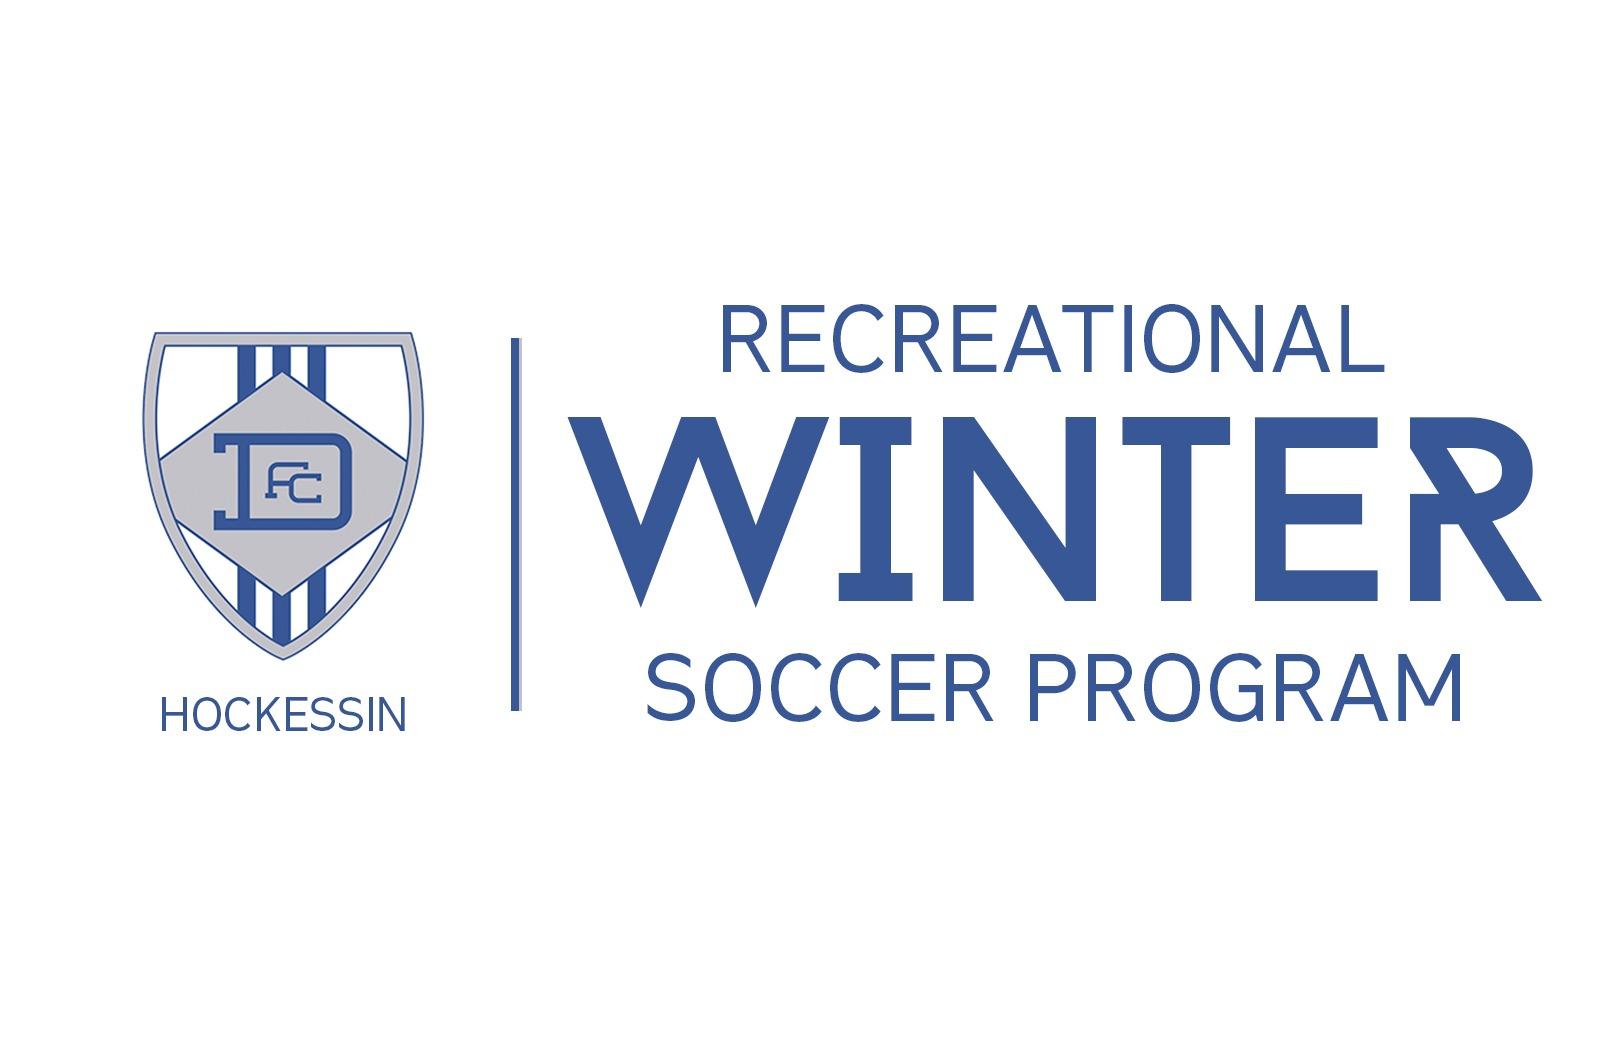 DEFC Hockessin Winter Recreational Soccer Program - Indoor Soccer